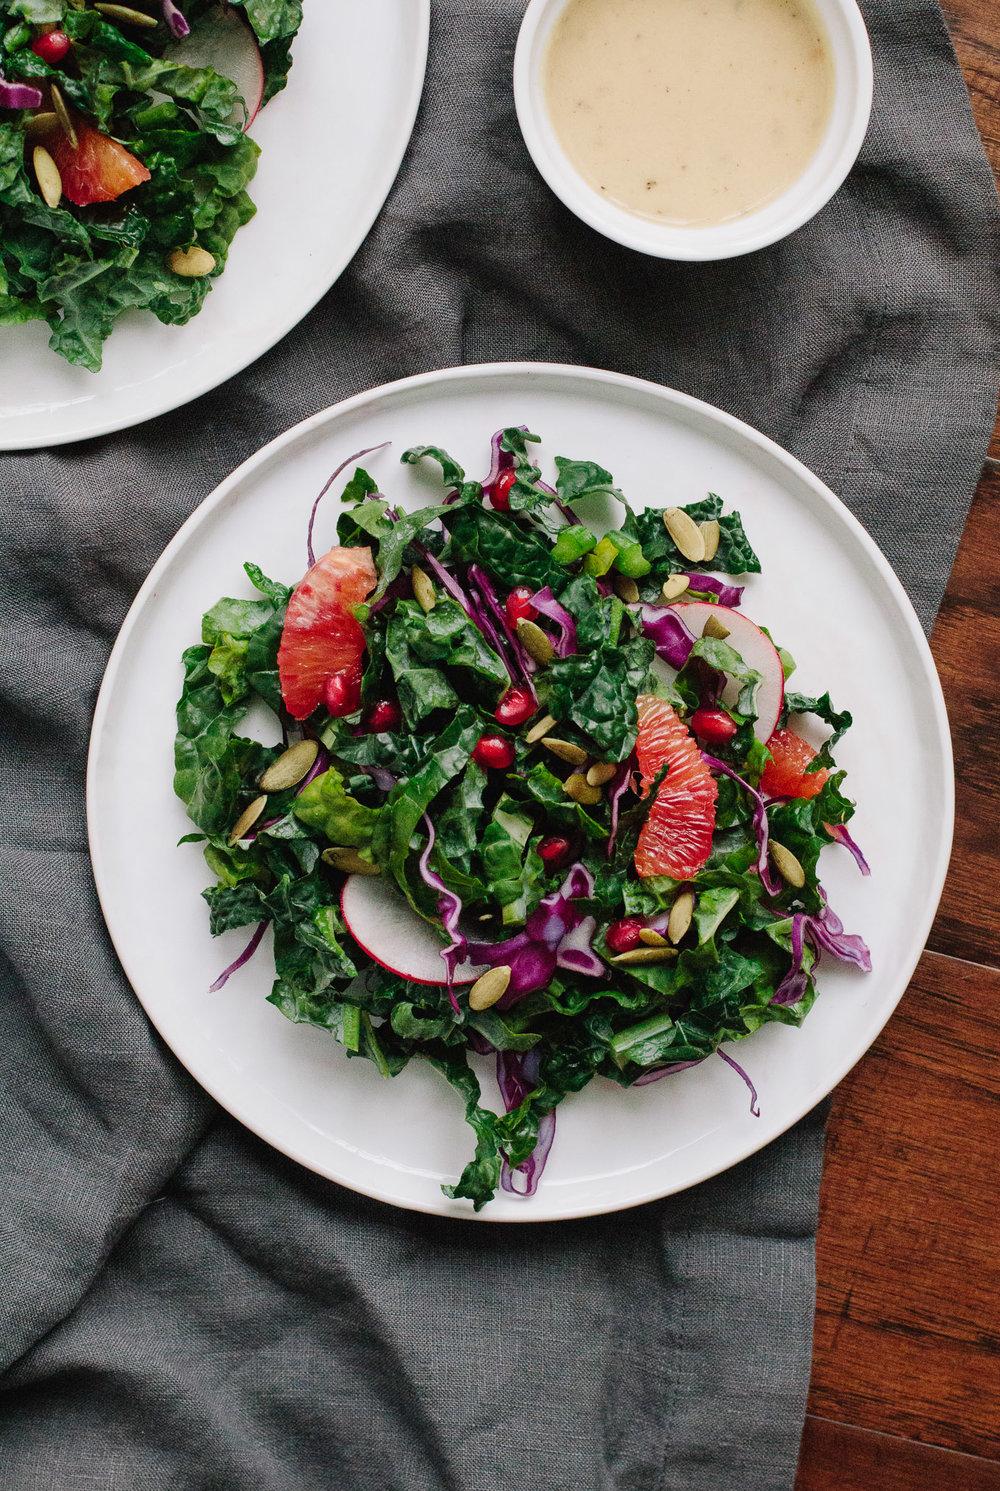 Winter-Citrus-Kale-Salad-1-of-11.jpg